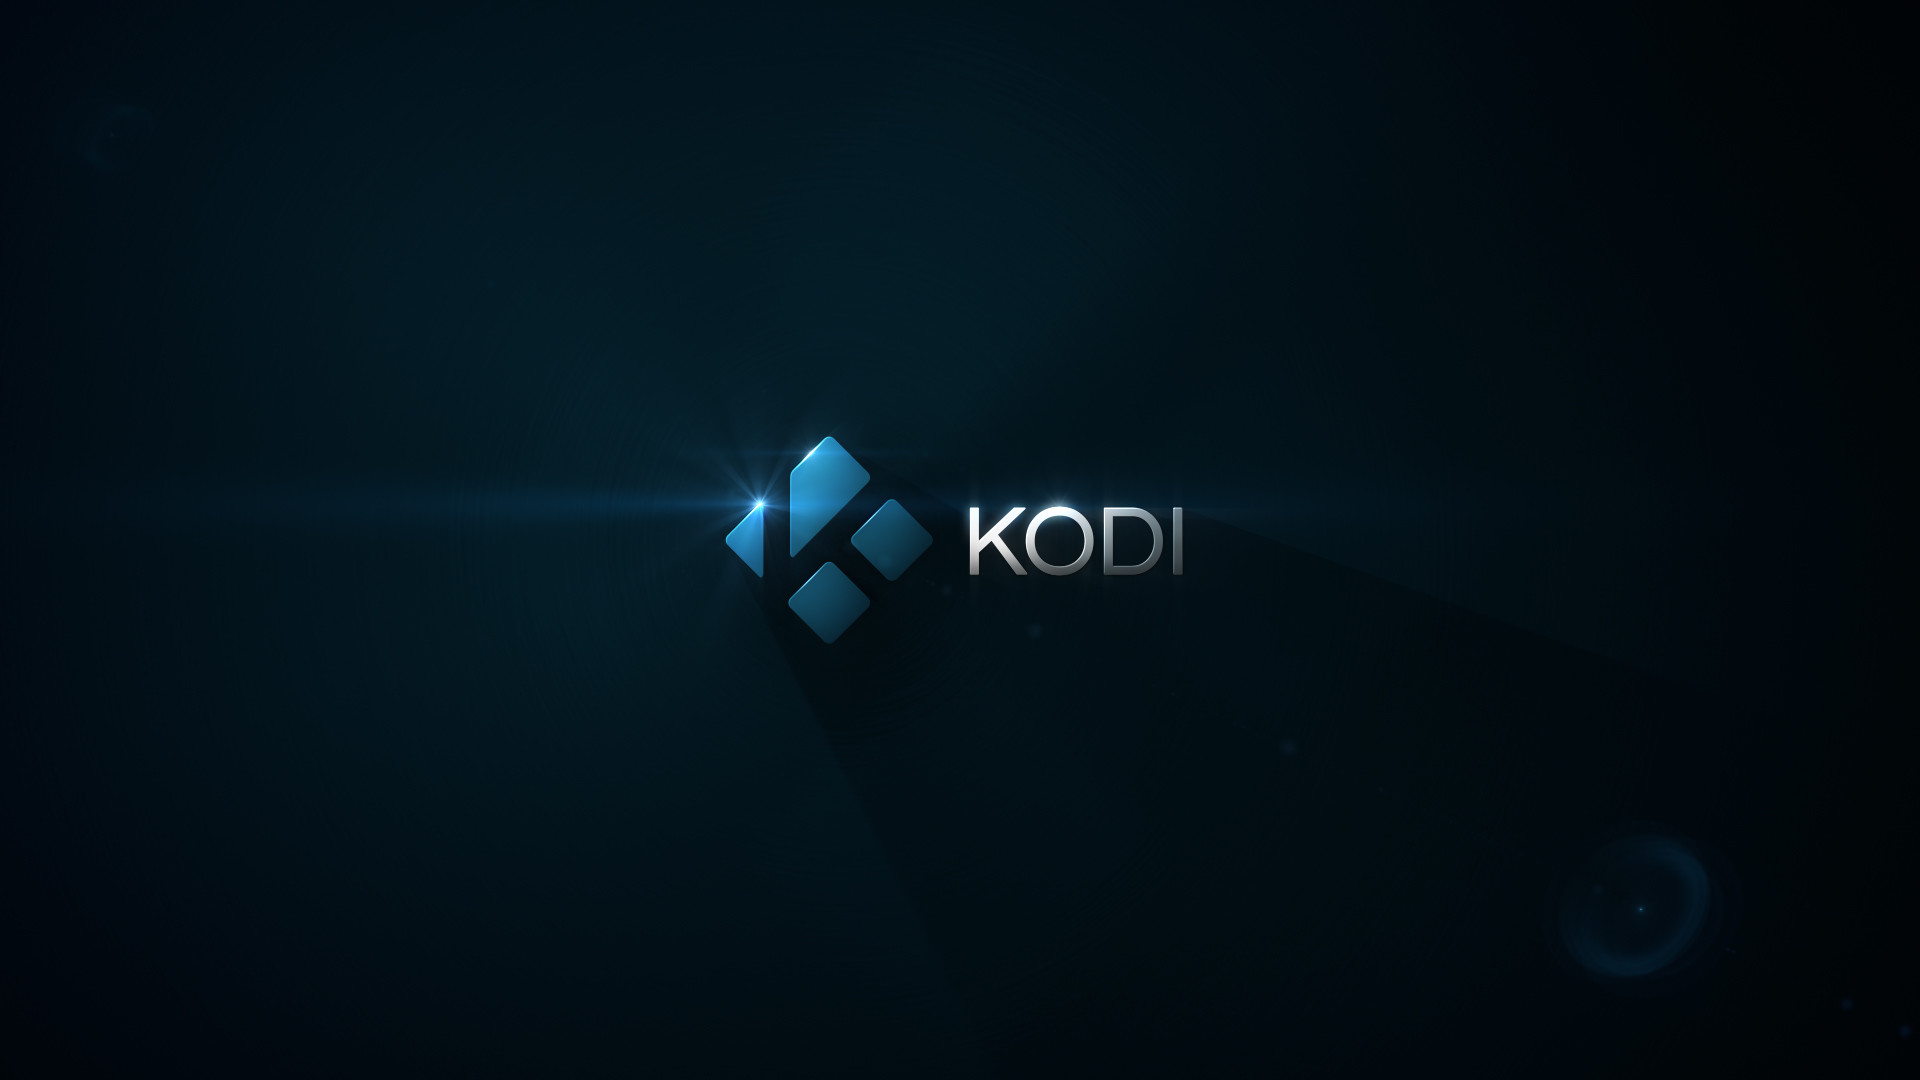 Kodi-Wallpaper-3A-1080p samfisher.jpg from samfisher